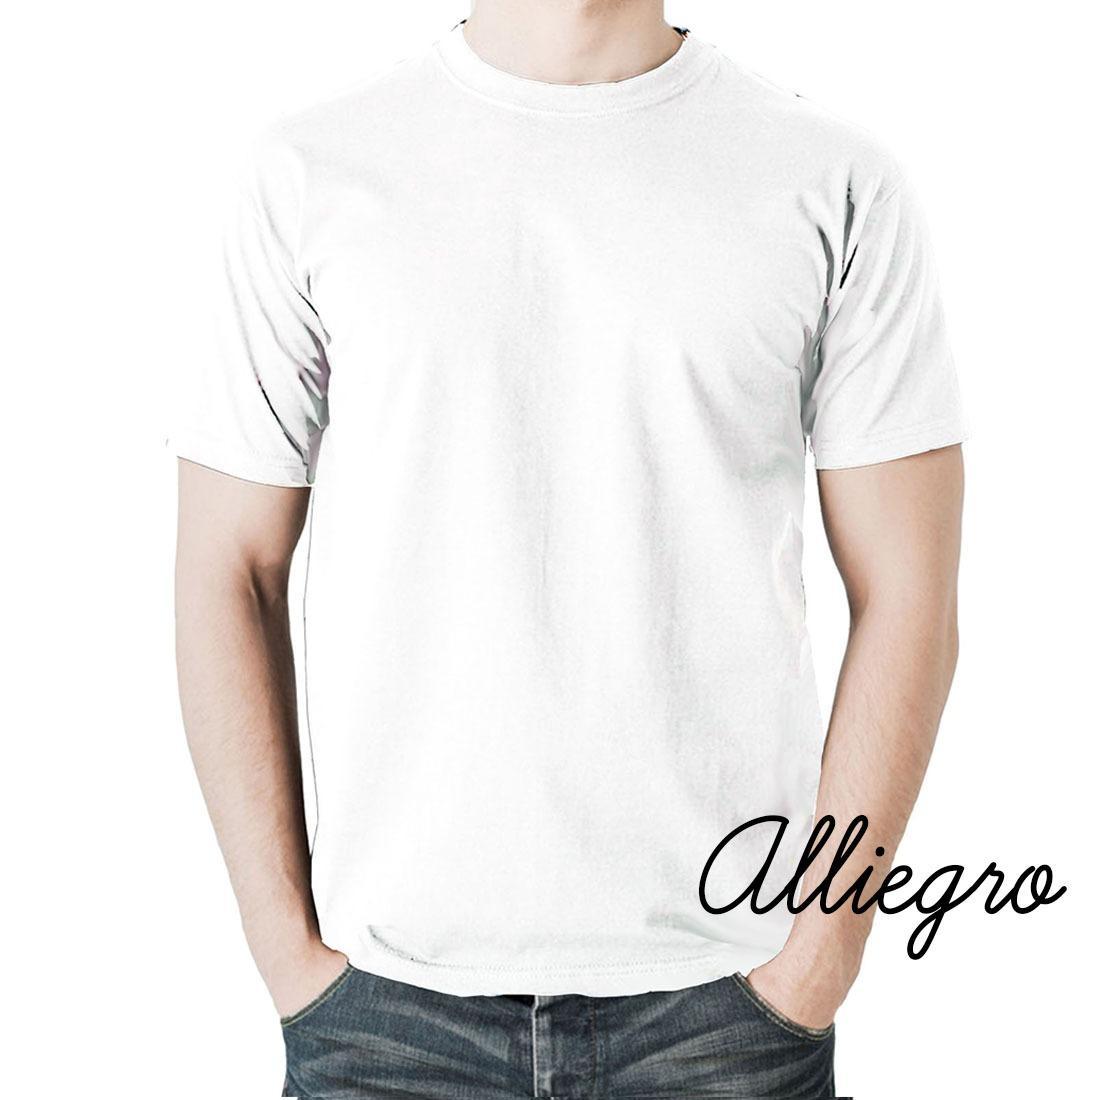 Alliegro Kaos Pria Polos Distro Premium - Kaos Terbaru Keren Murah Tumblr  Tee Dewasa Putih 7538b28a27